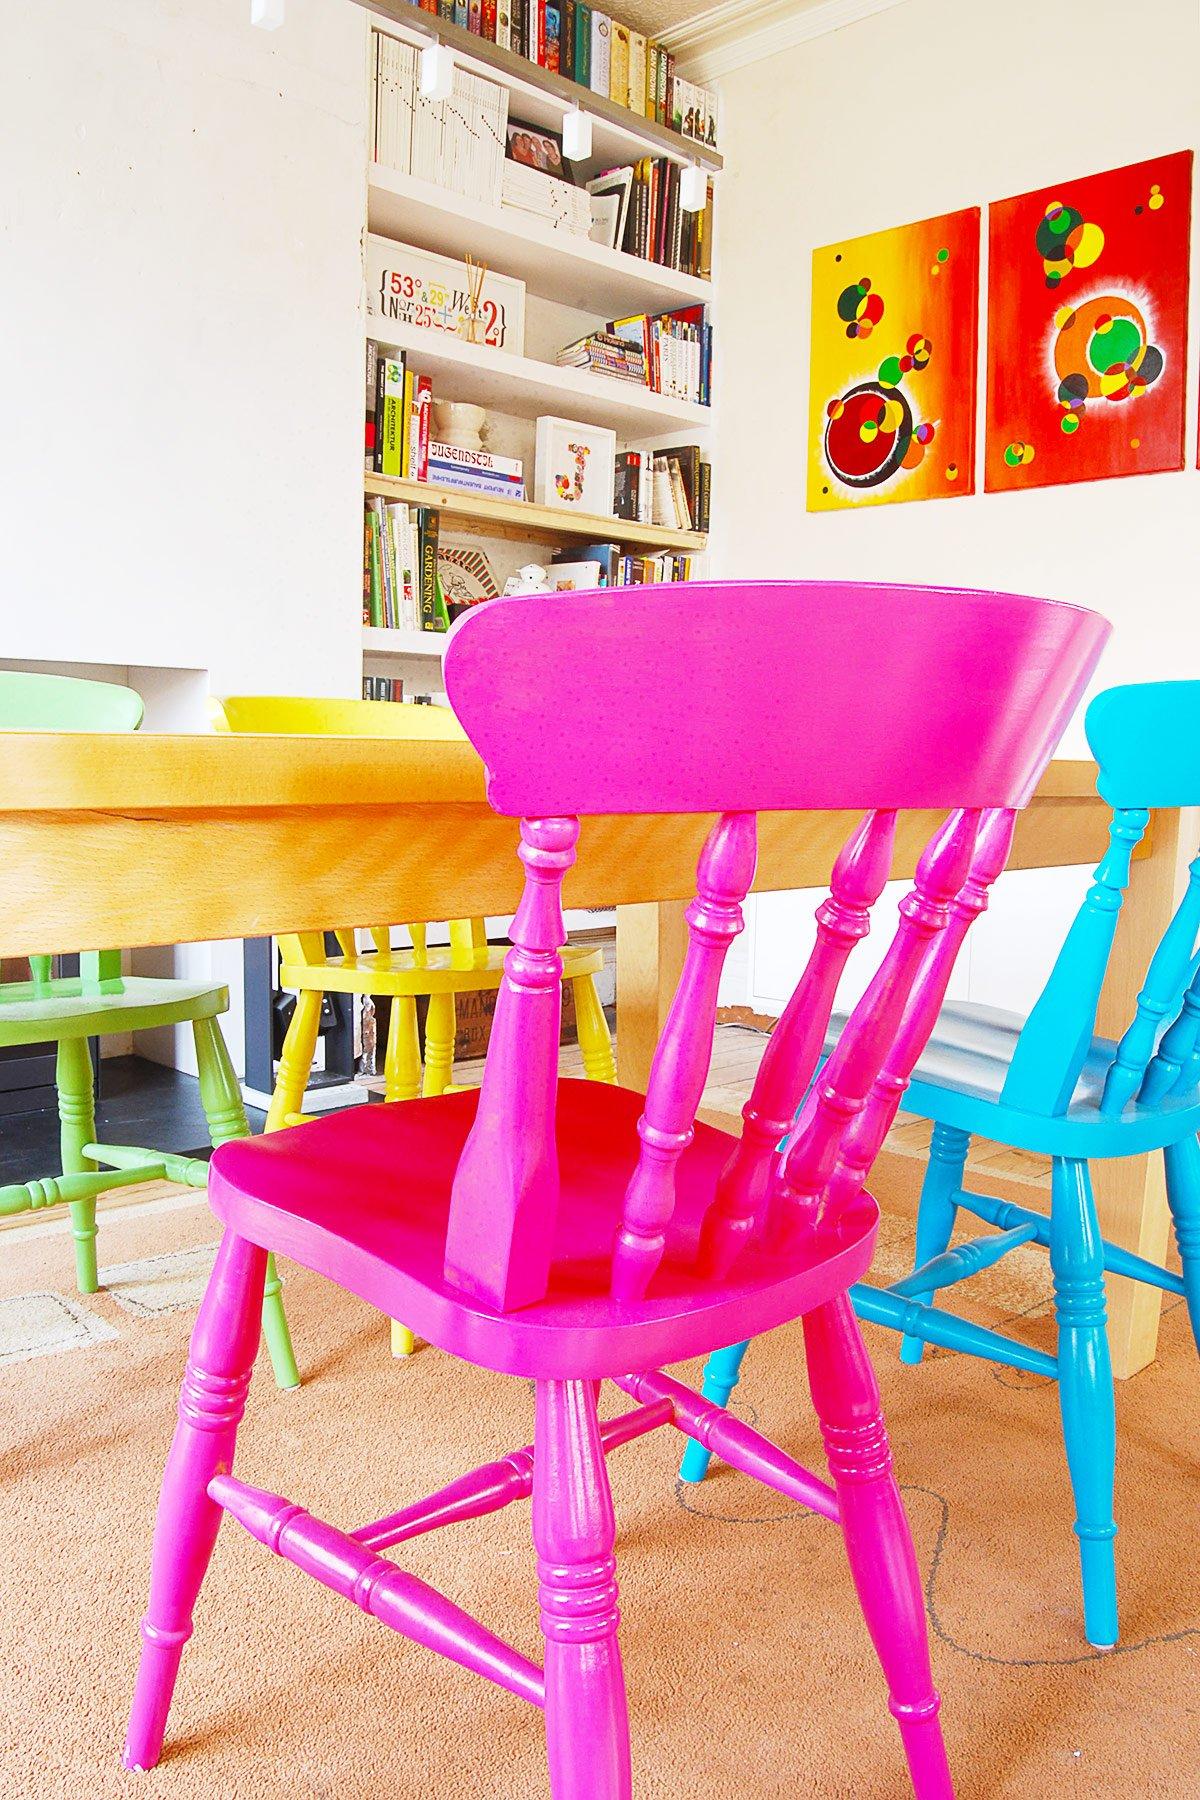 Reforma de cadeira colorida para mesa de jantar de madeira